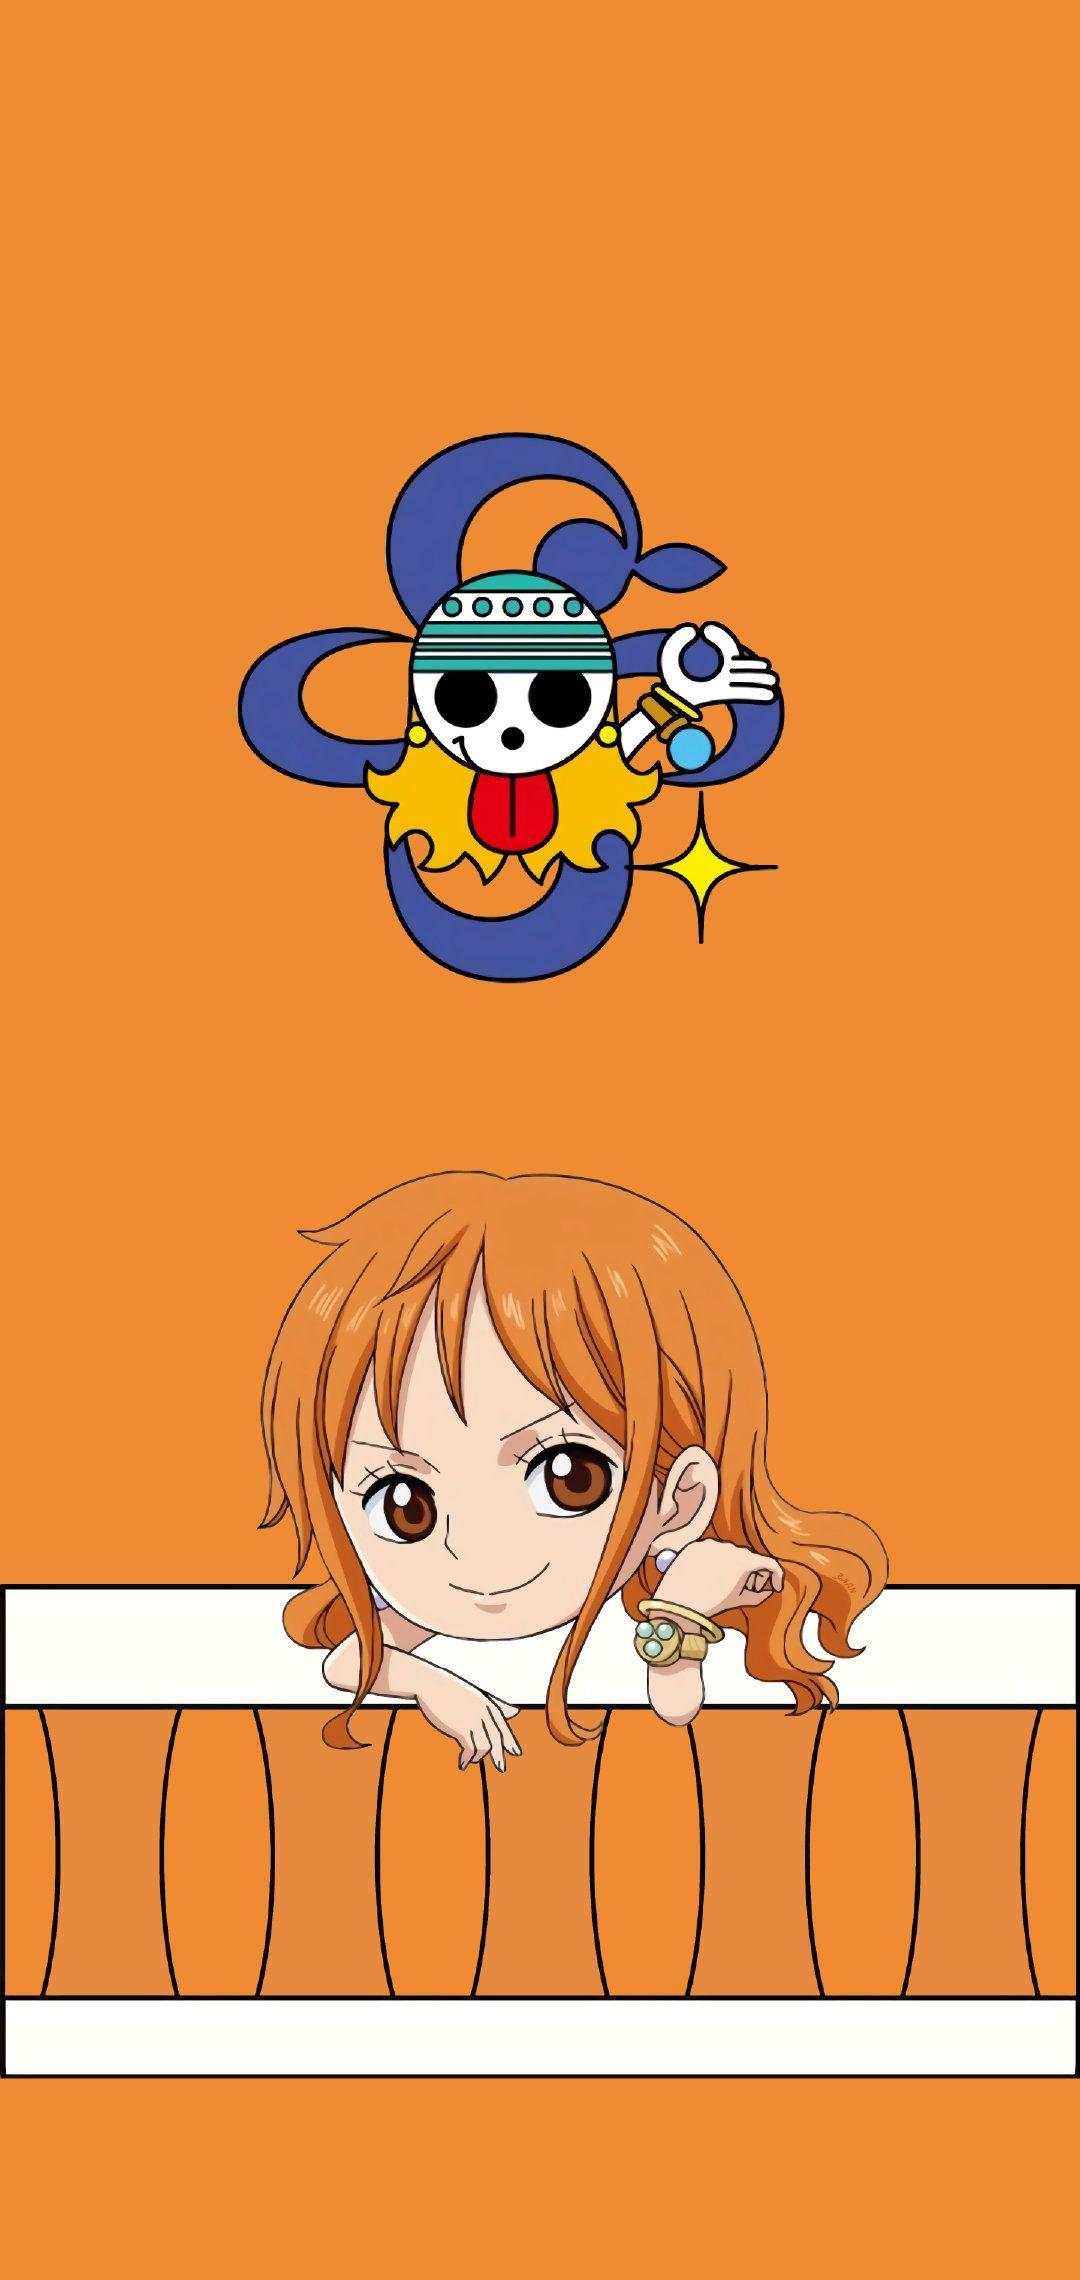 Pin oleh Abrar di Nami Gambar karakter, Animasi, Topi jerami